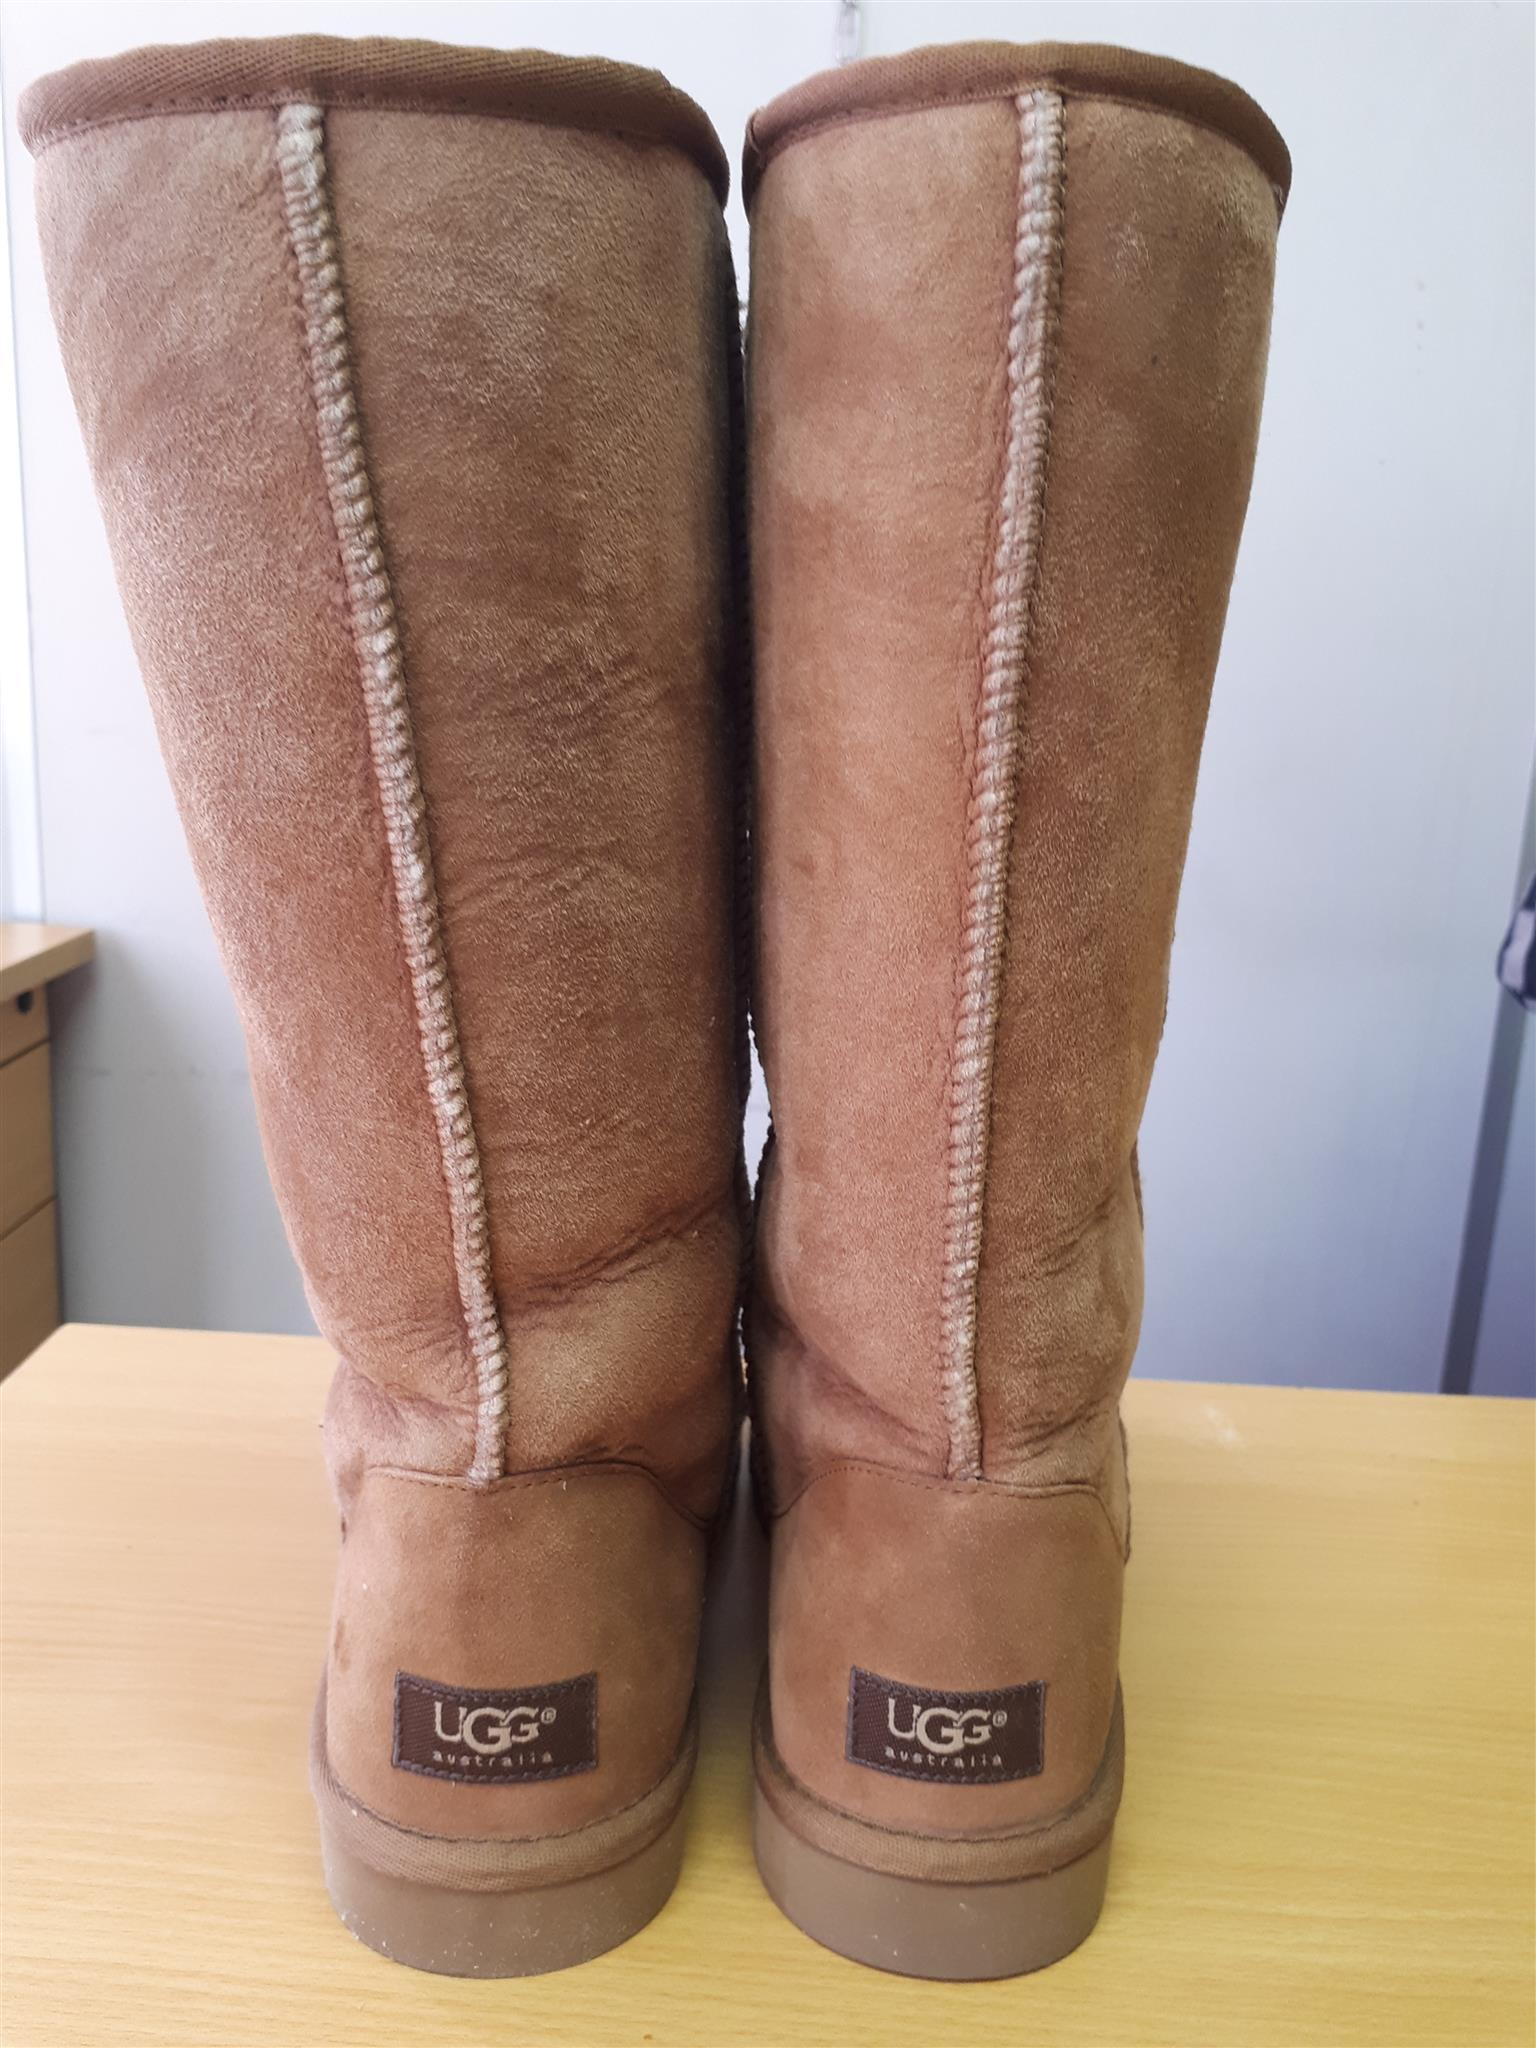 Genuine Australian UGG Boots - Chestnut